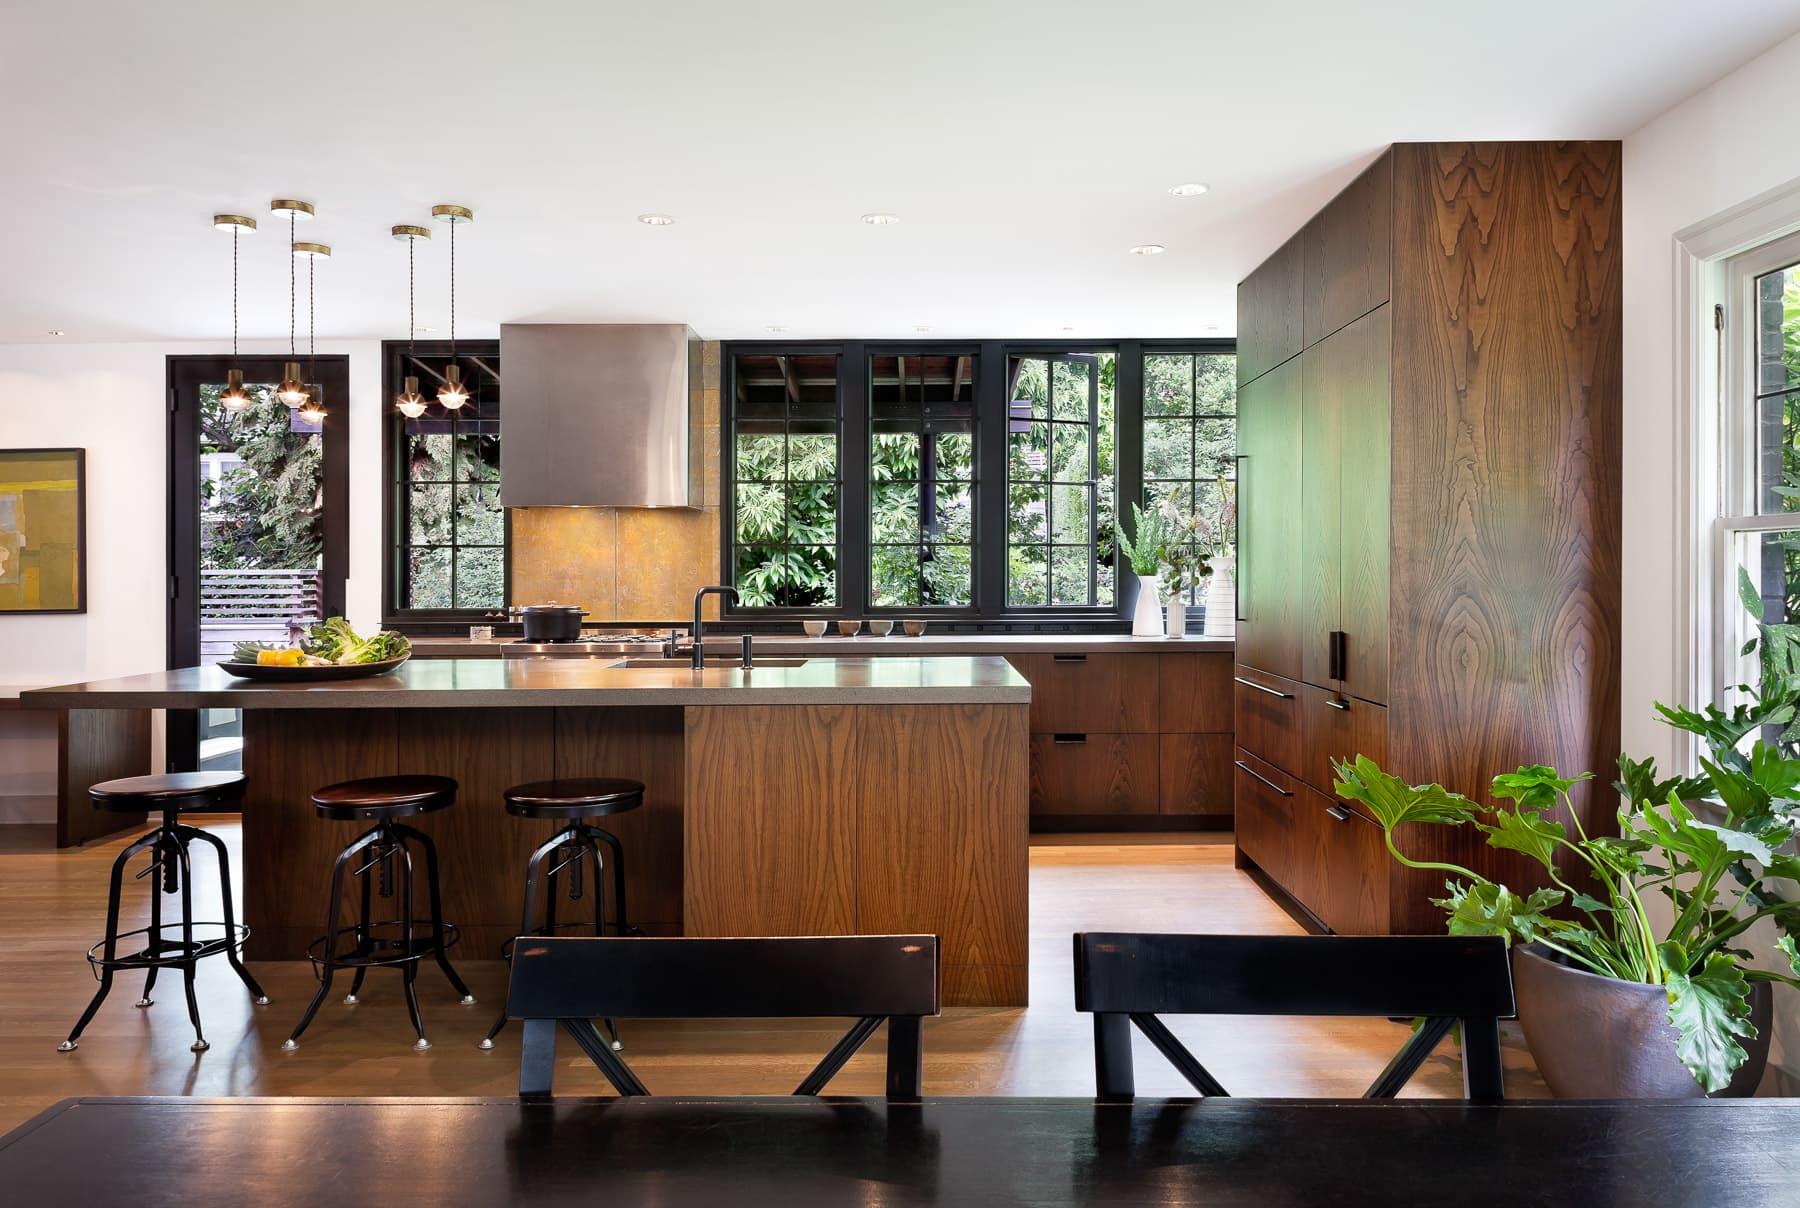 rerucha-studio-architecture-interior-design-seattle-brick-house-transformed-03-web.png